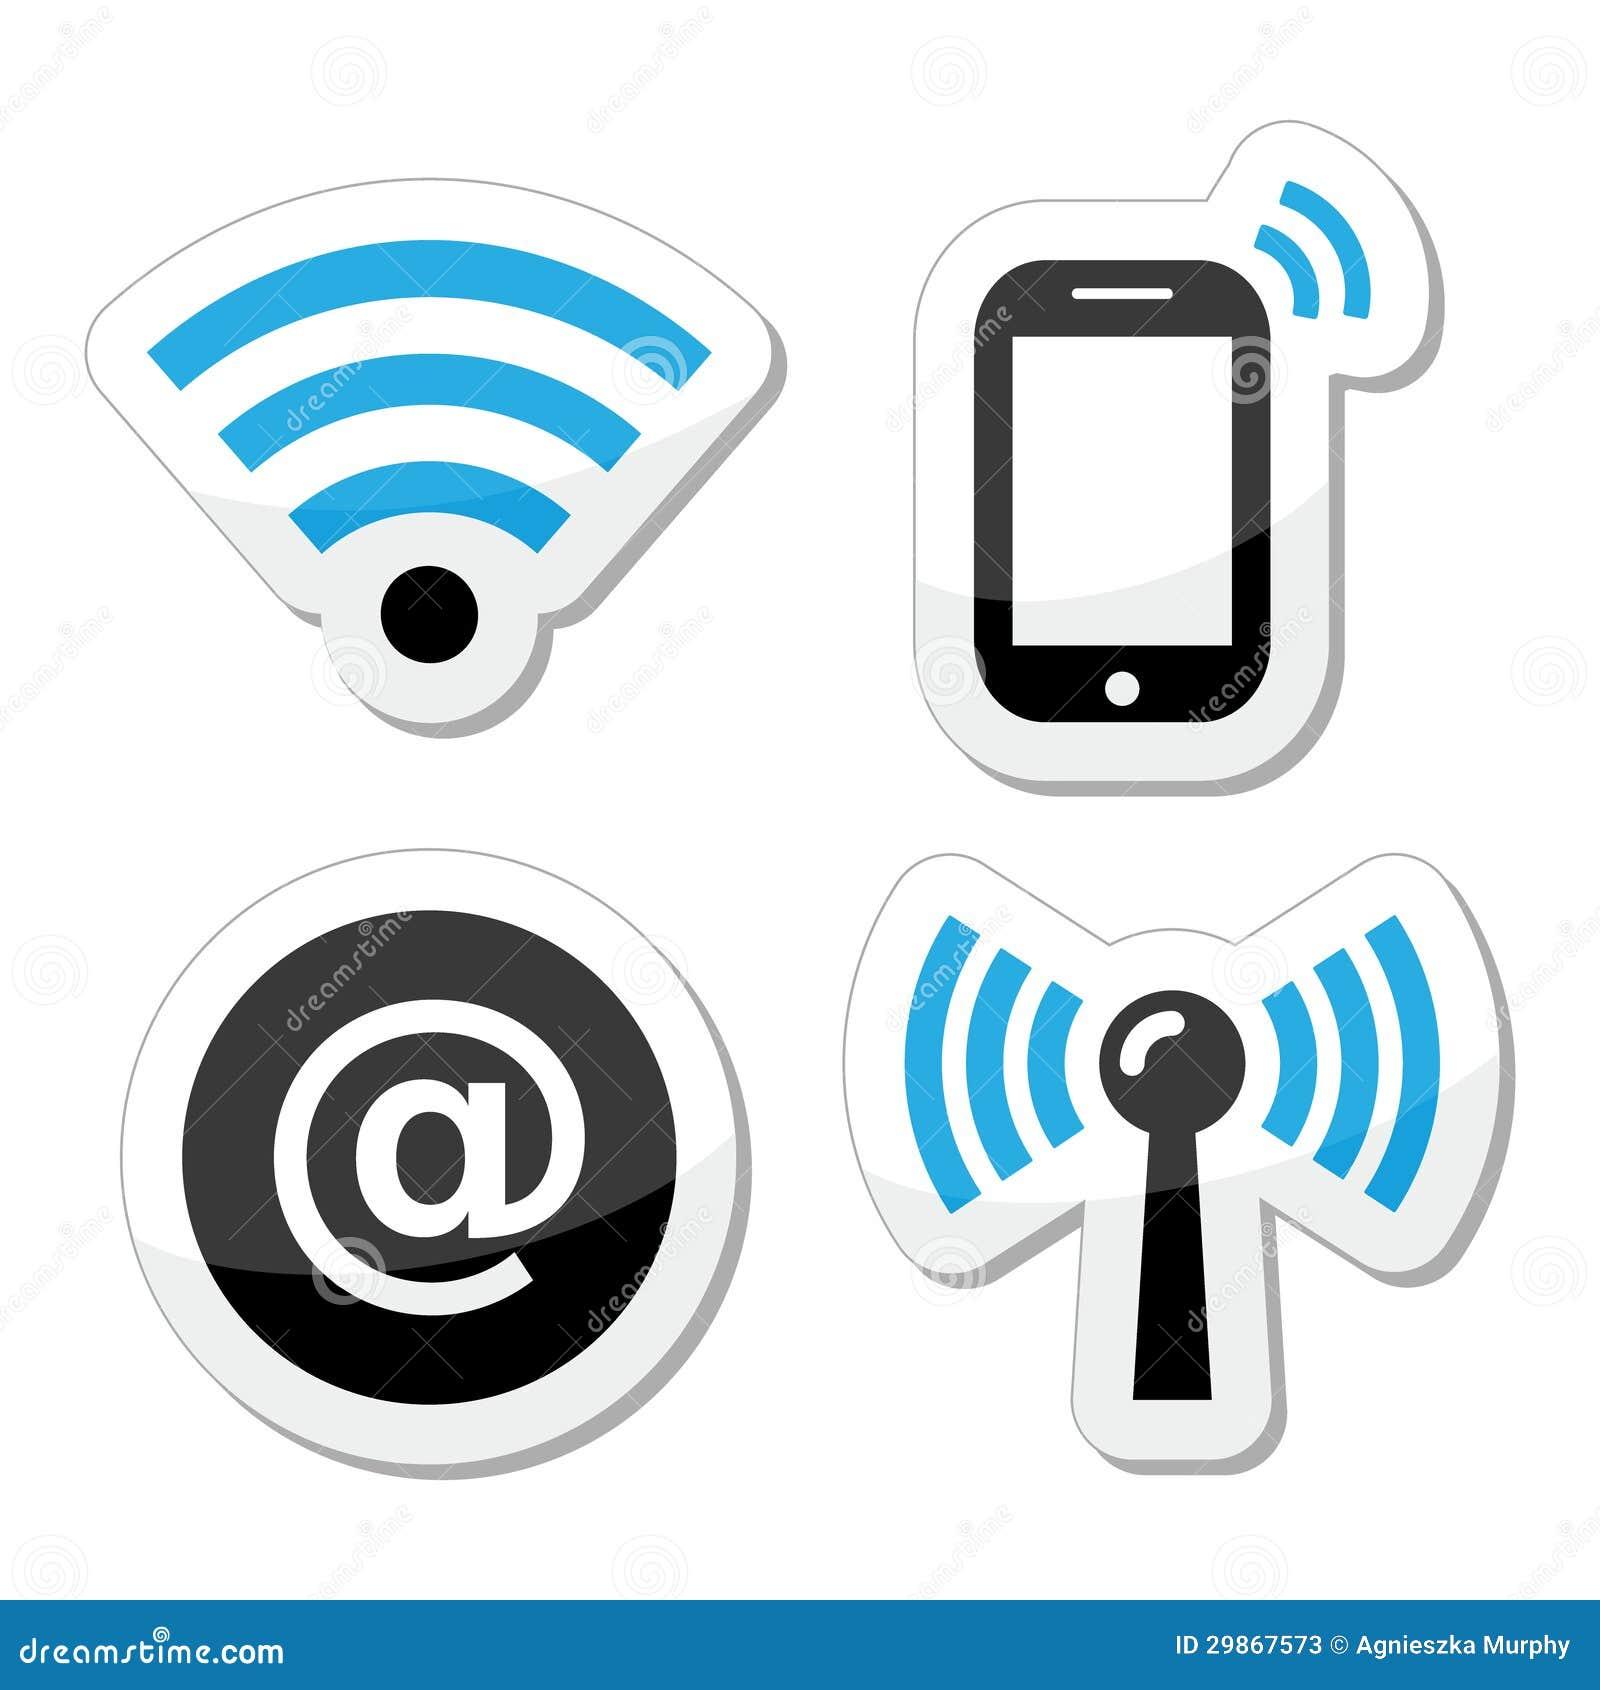 Wireless Internet Equipment ~ Wifi network internet zone icons set stock illustration